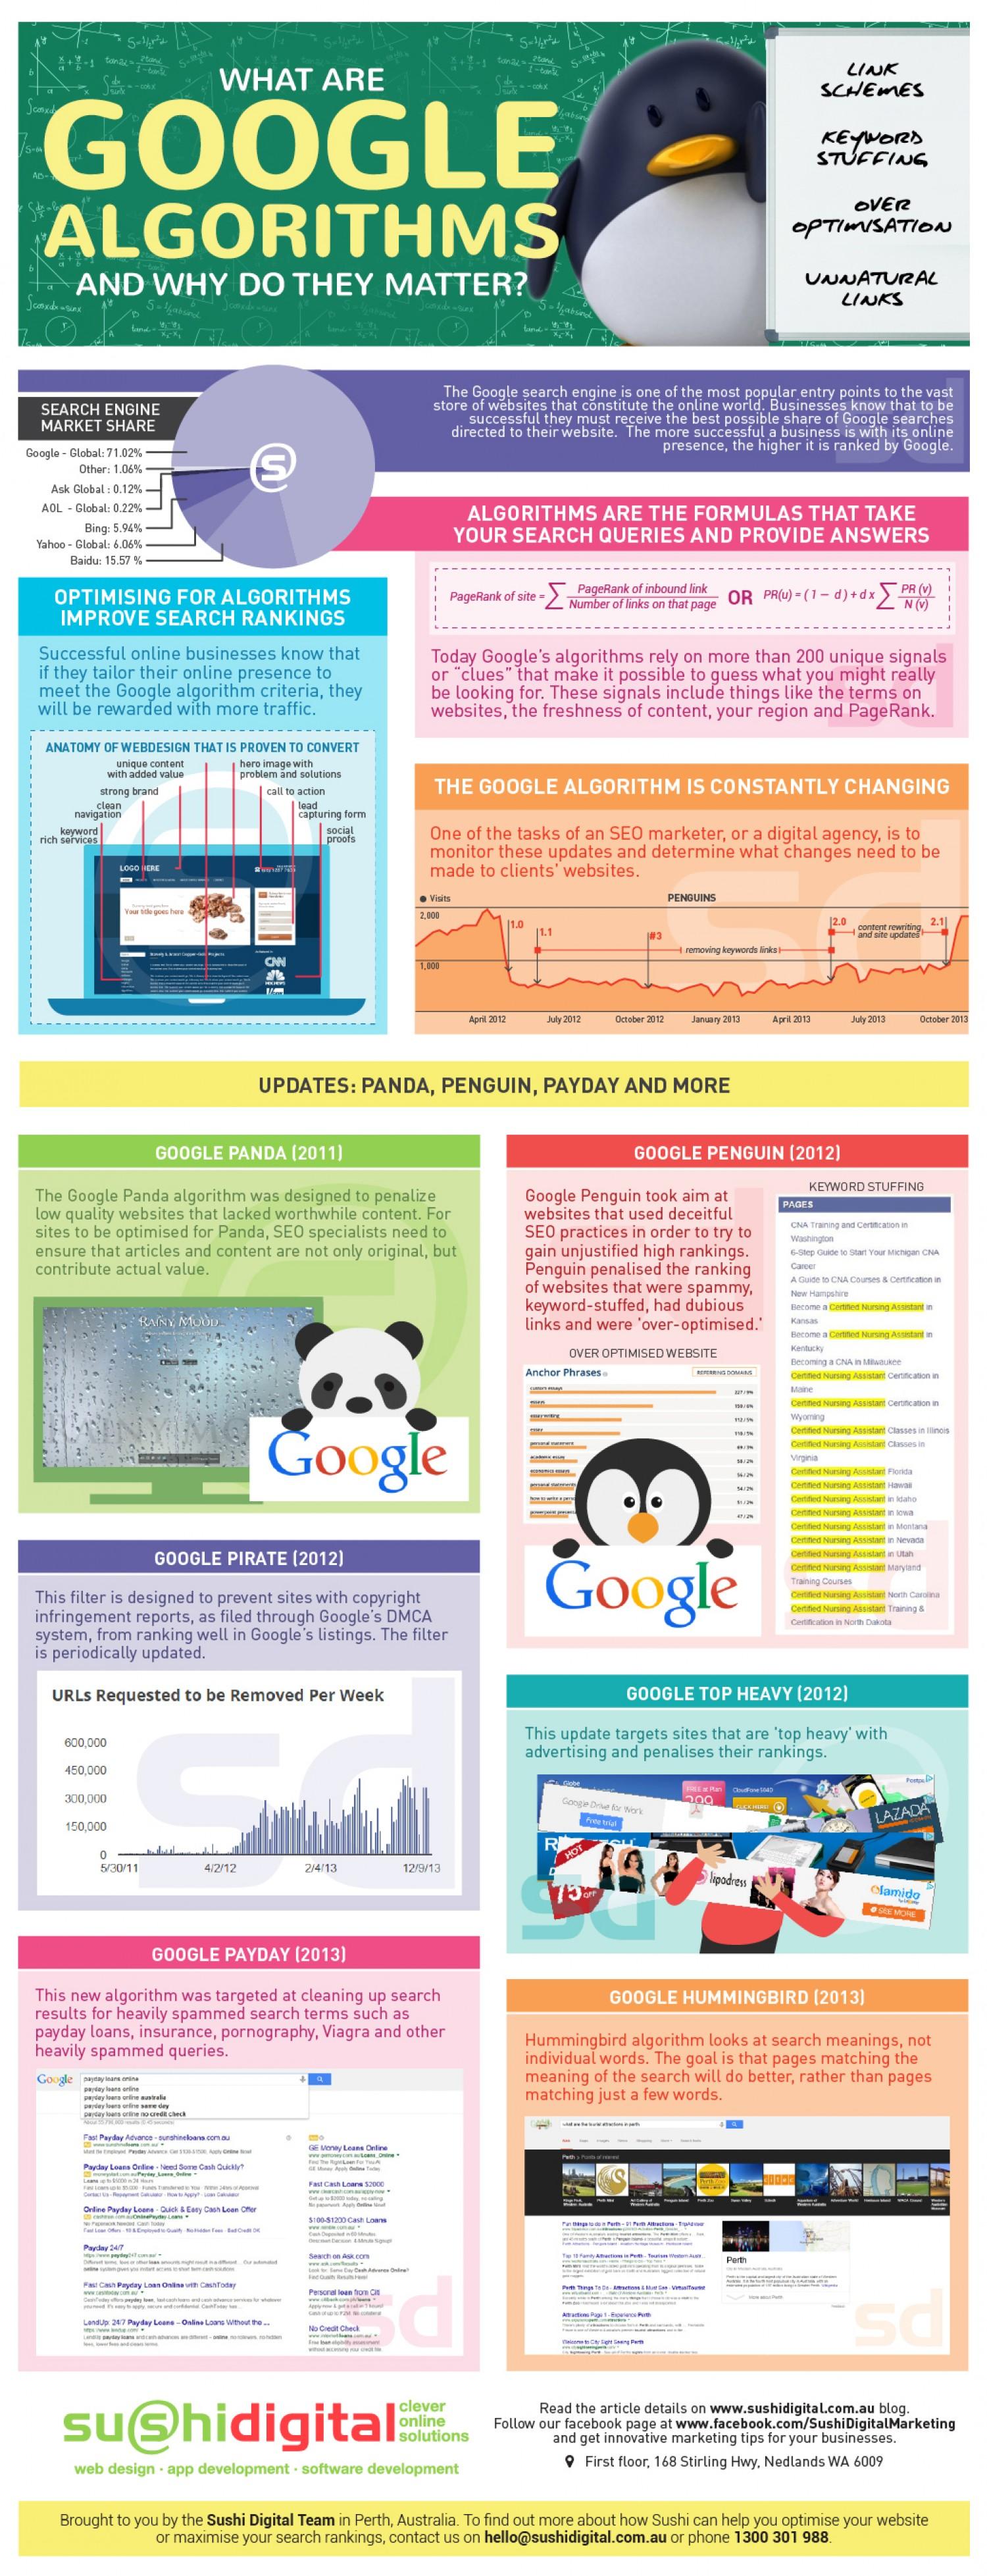 seo-algoritmos-de-google